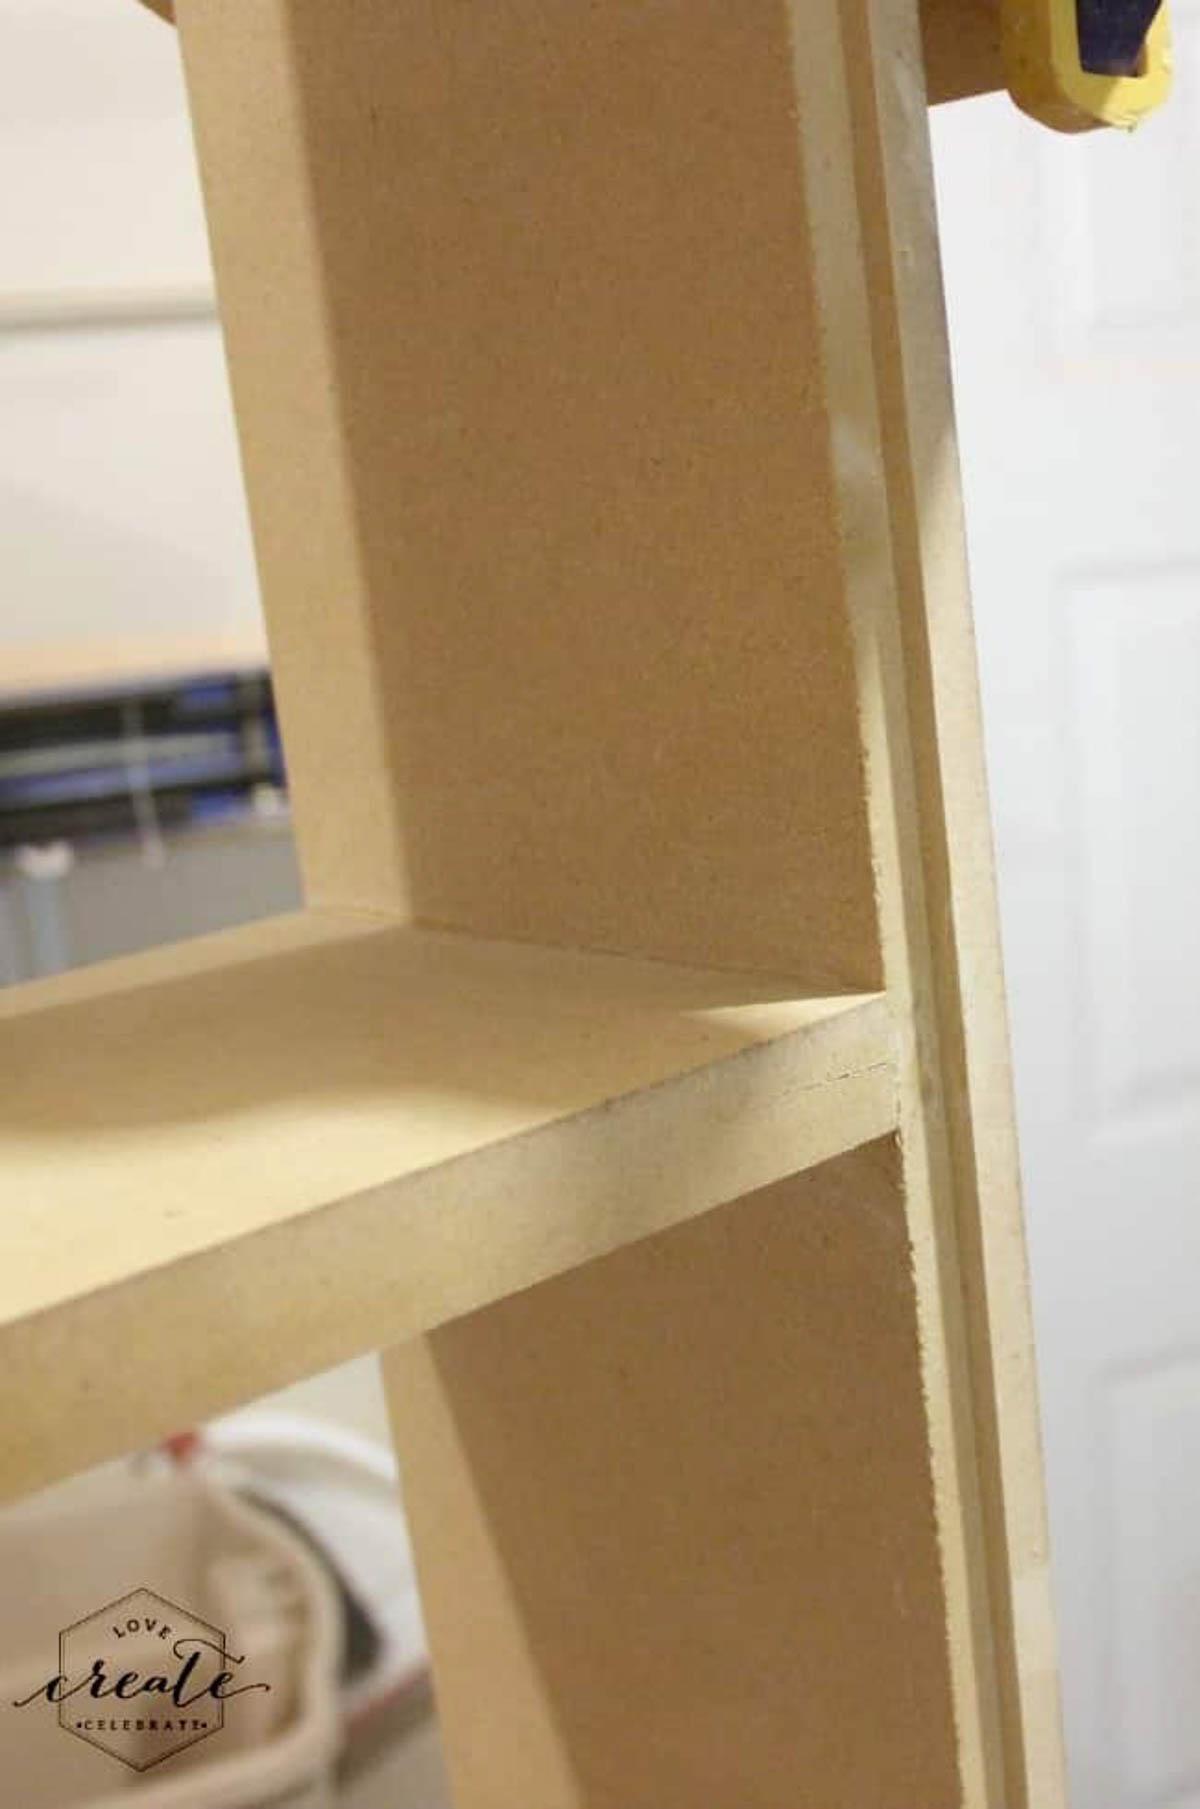 Framed and glued house bookshelf